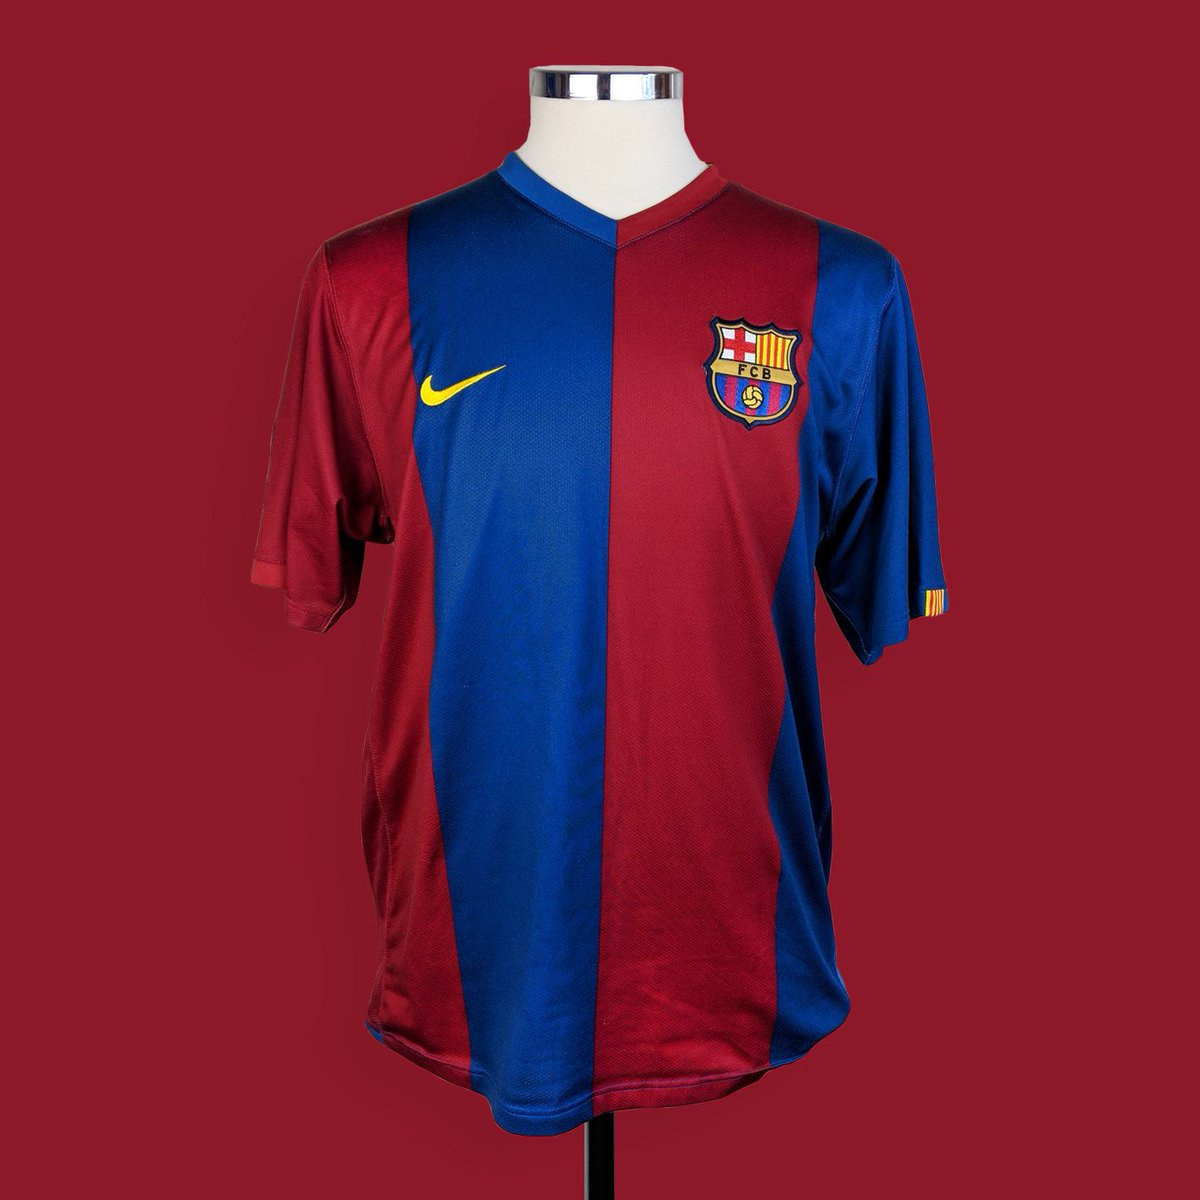 newest 6b489 6e884 Classic Football Shirts on Twitter: